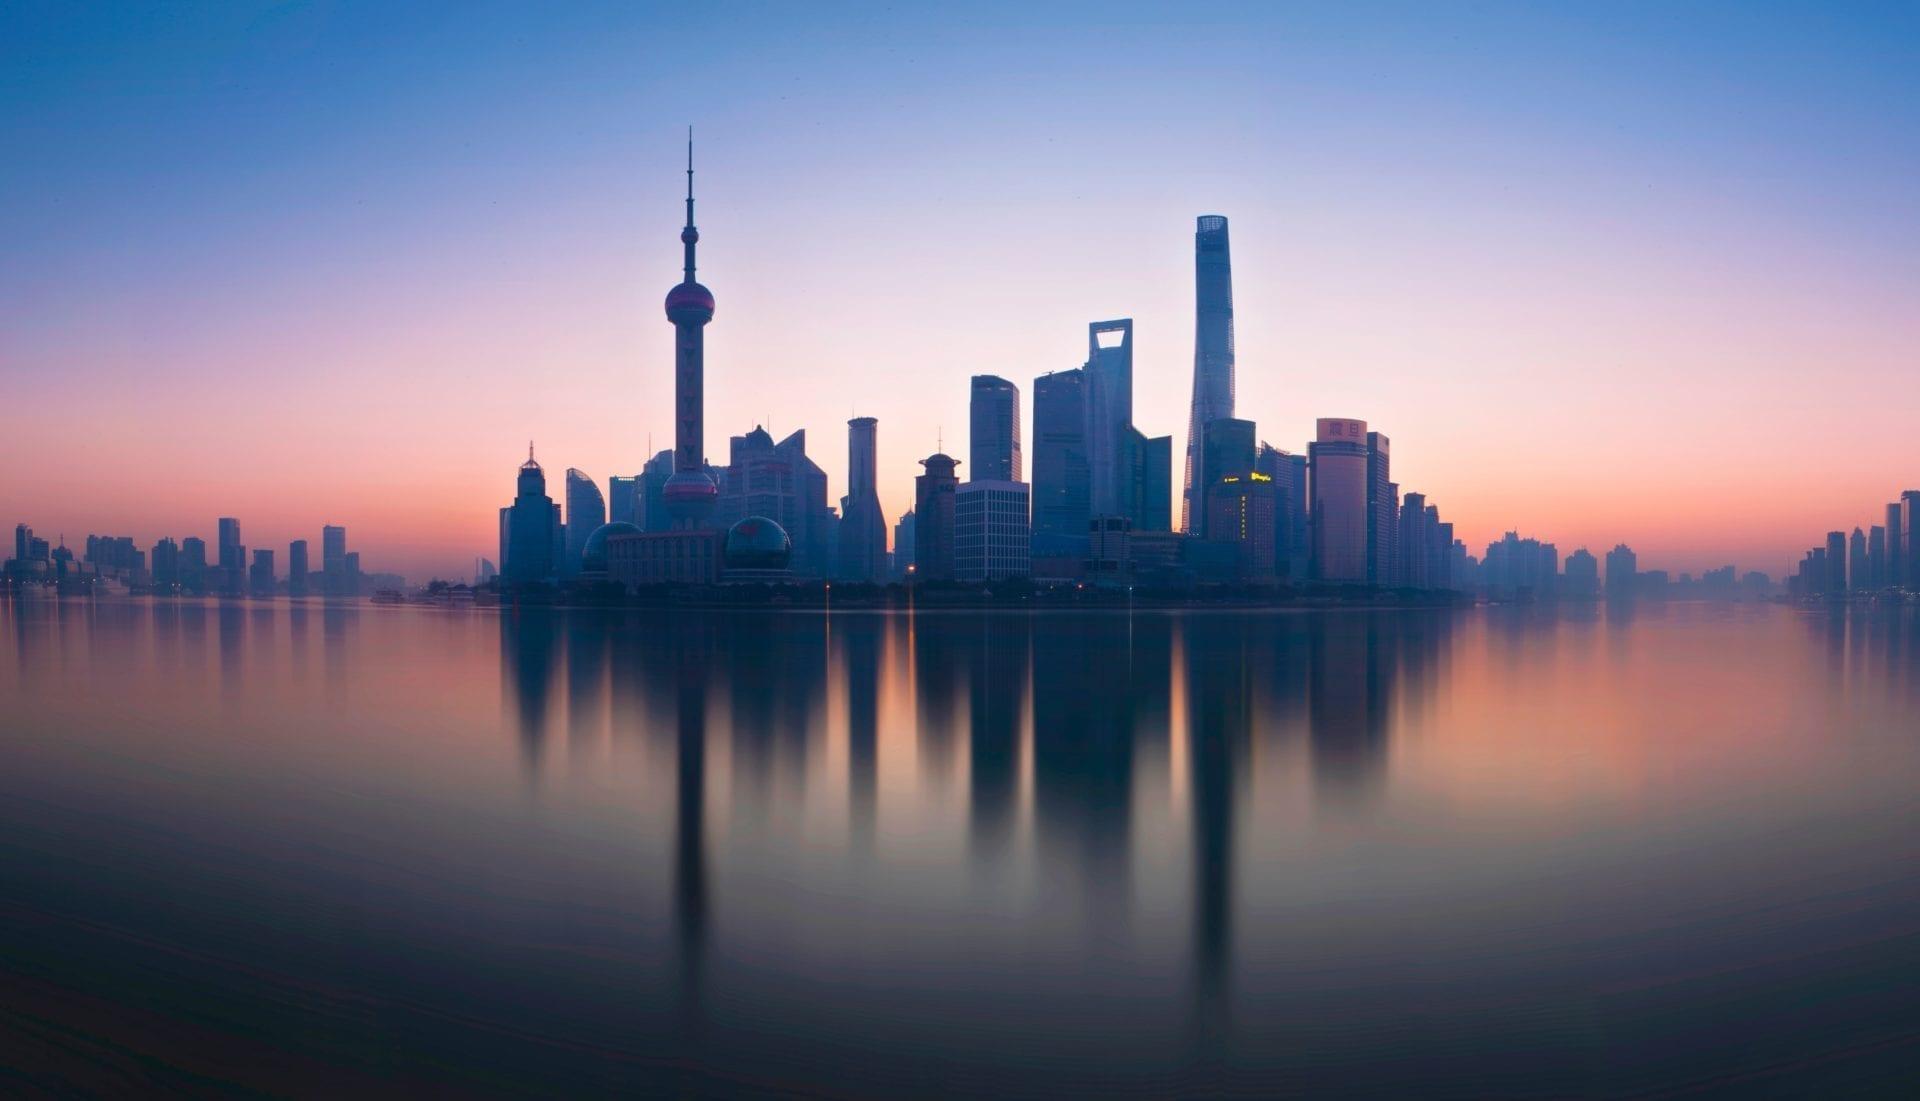 View of shanghai town